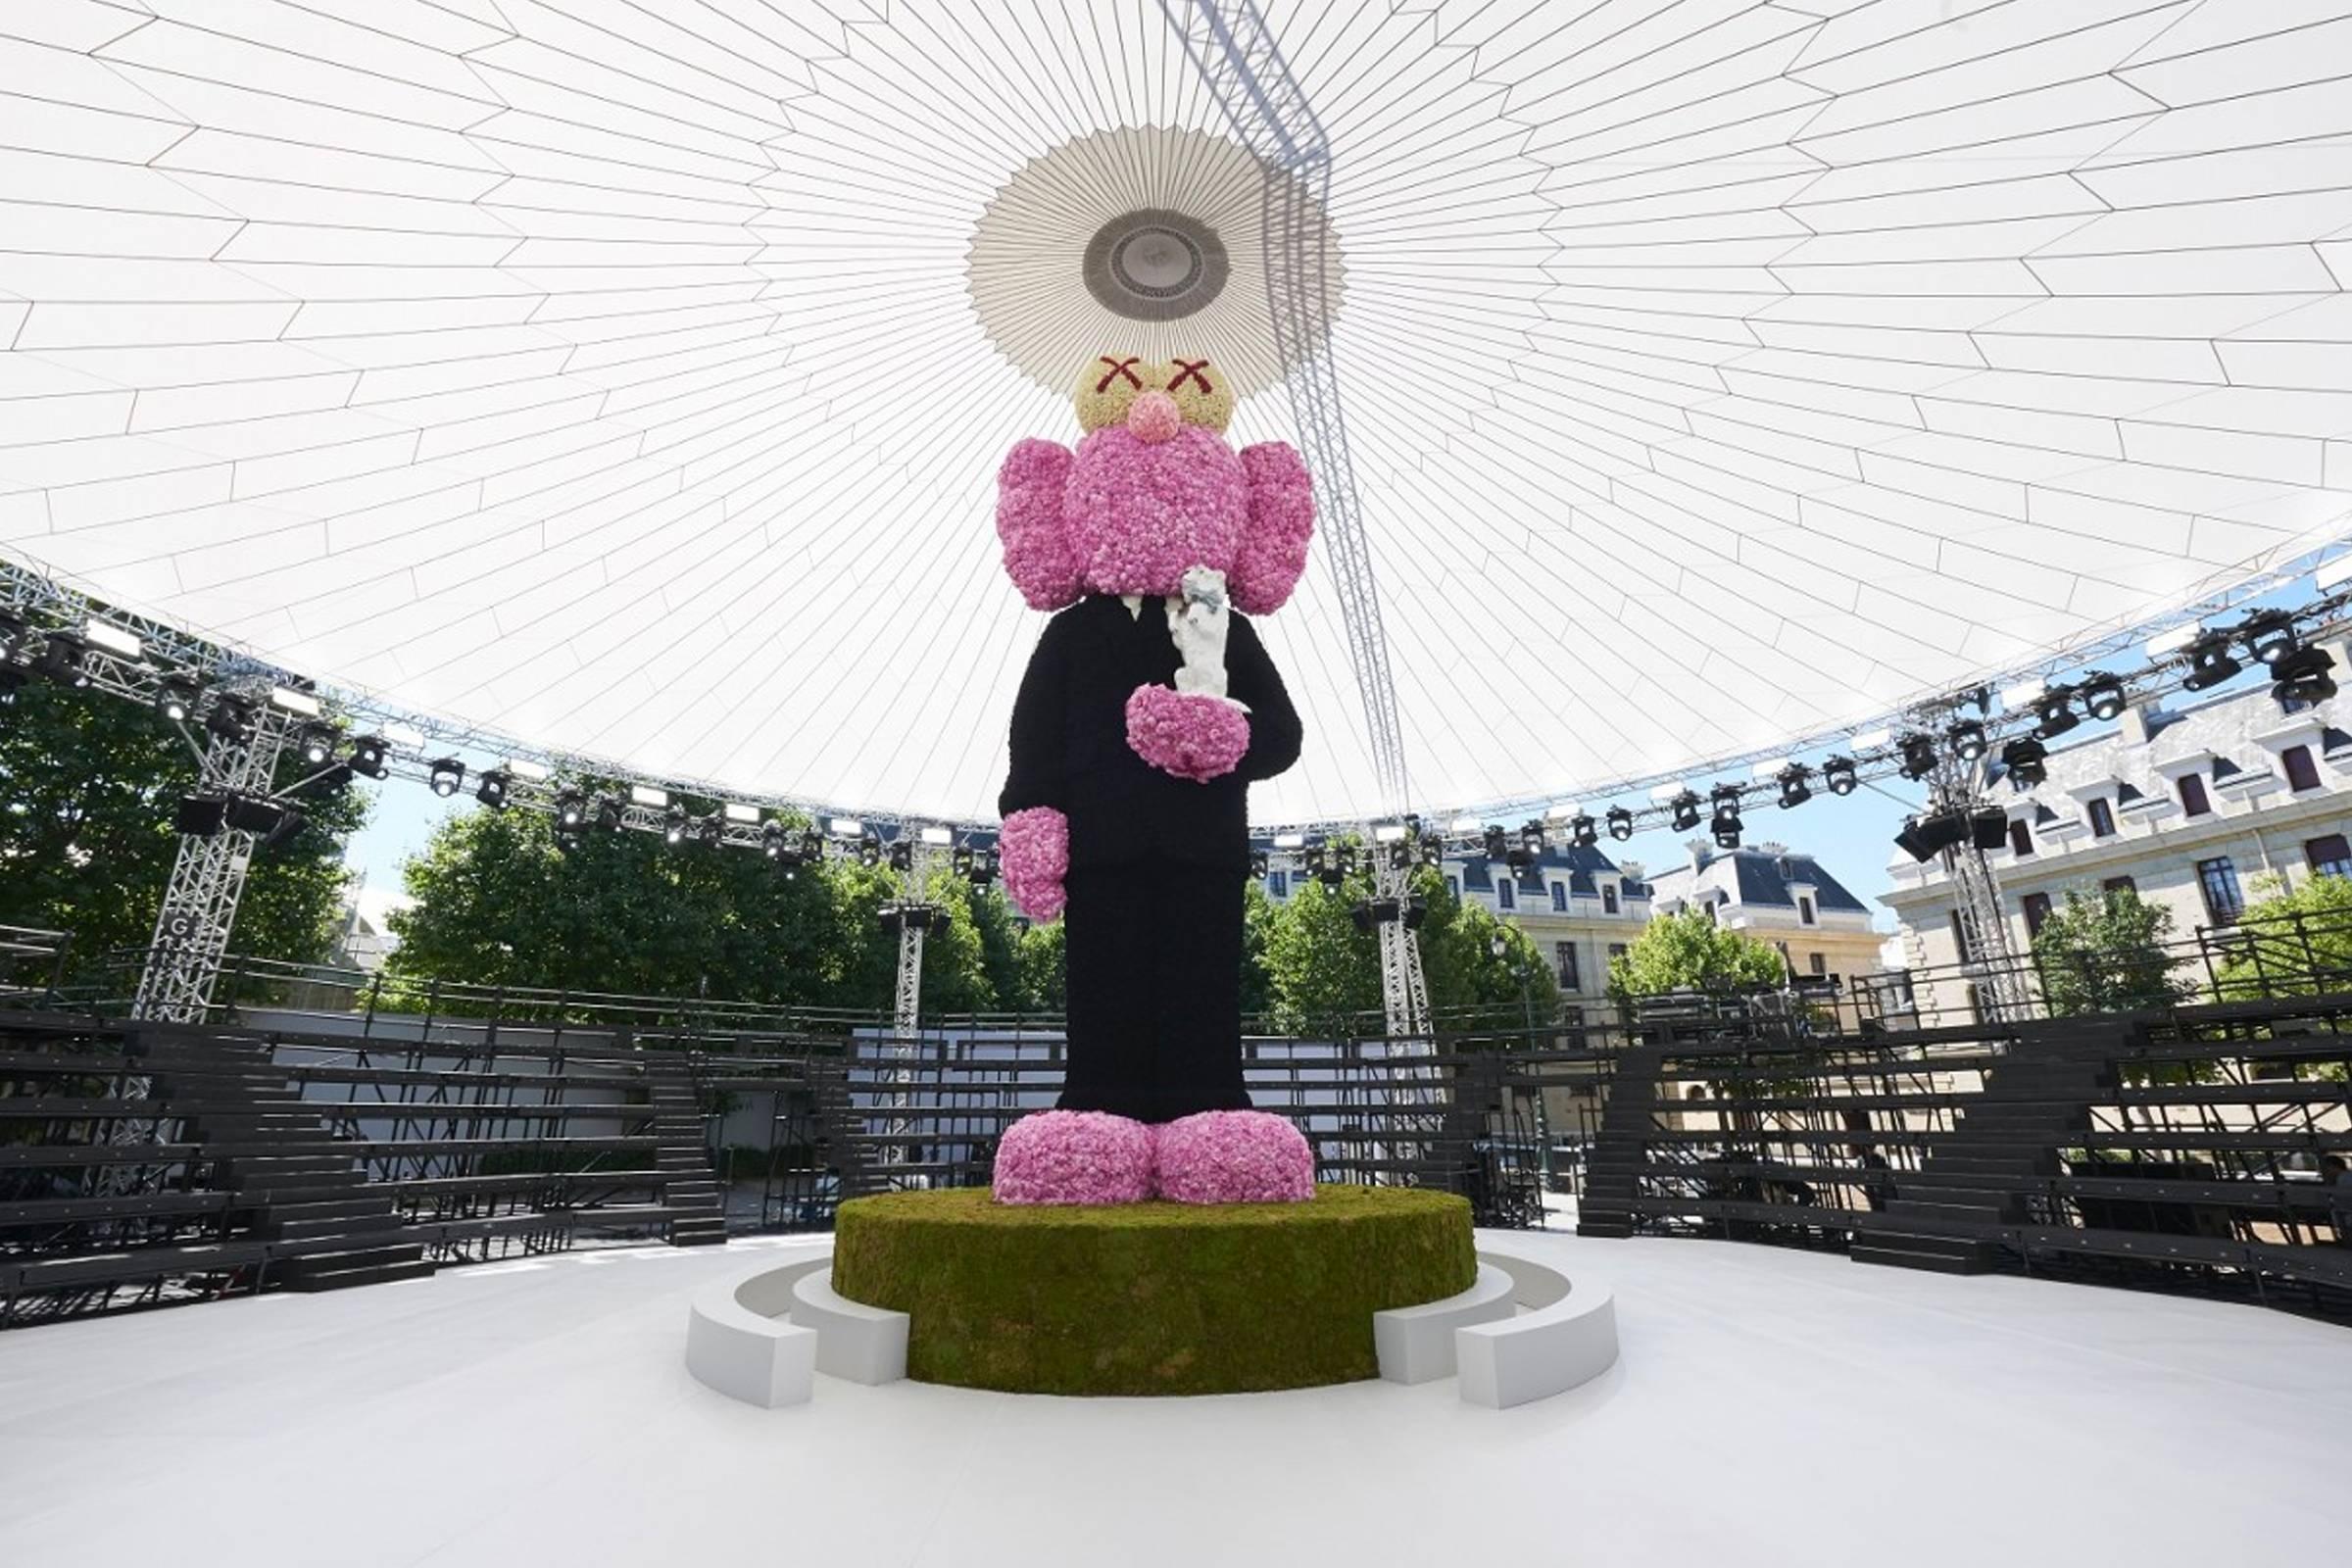 KAWS x Dior Men's Companion statue as part of Dior Men's Spring/Summer 2019 collection